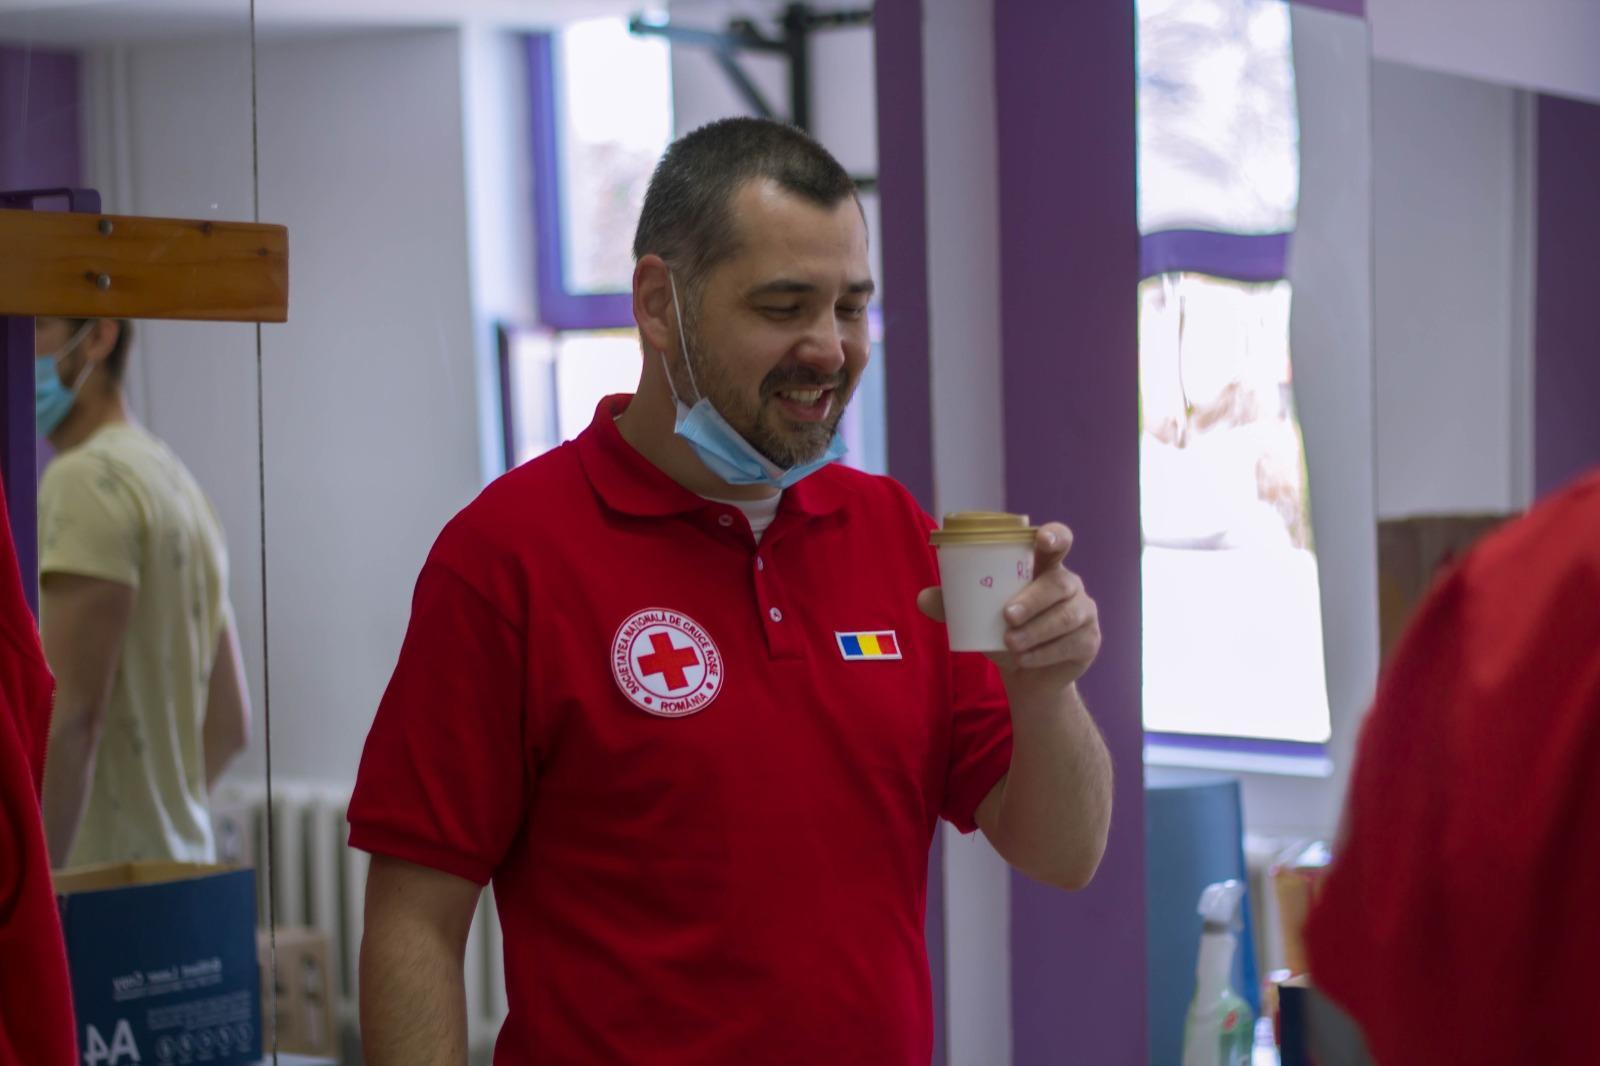 La mulți ani, Răzvan Biriș- directorul Crucii Roșii Filiala Sibiu!